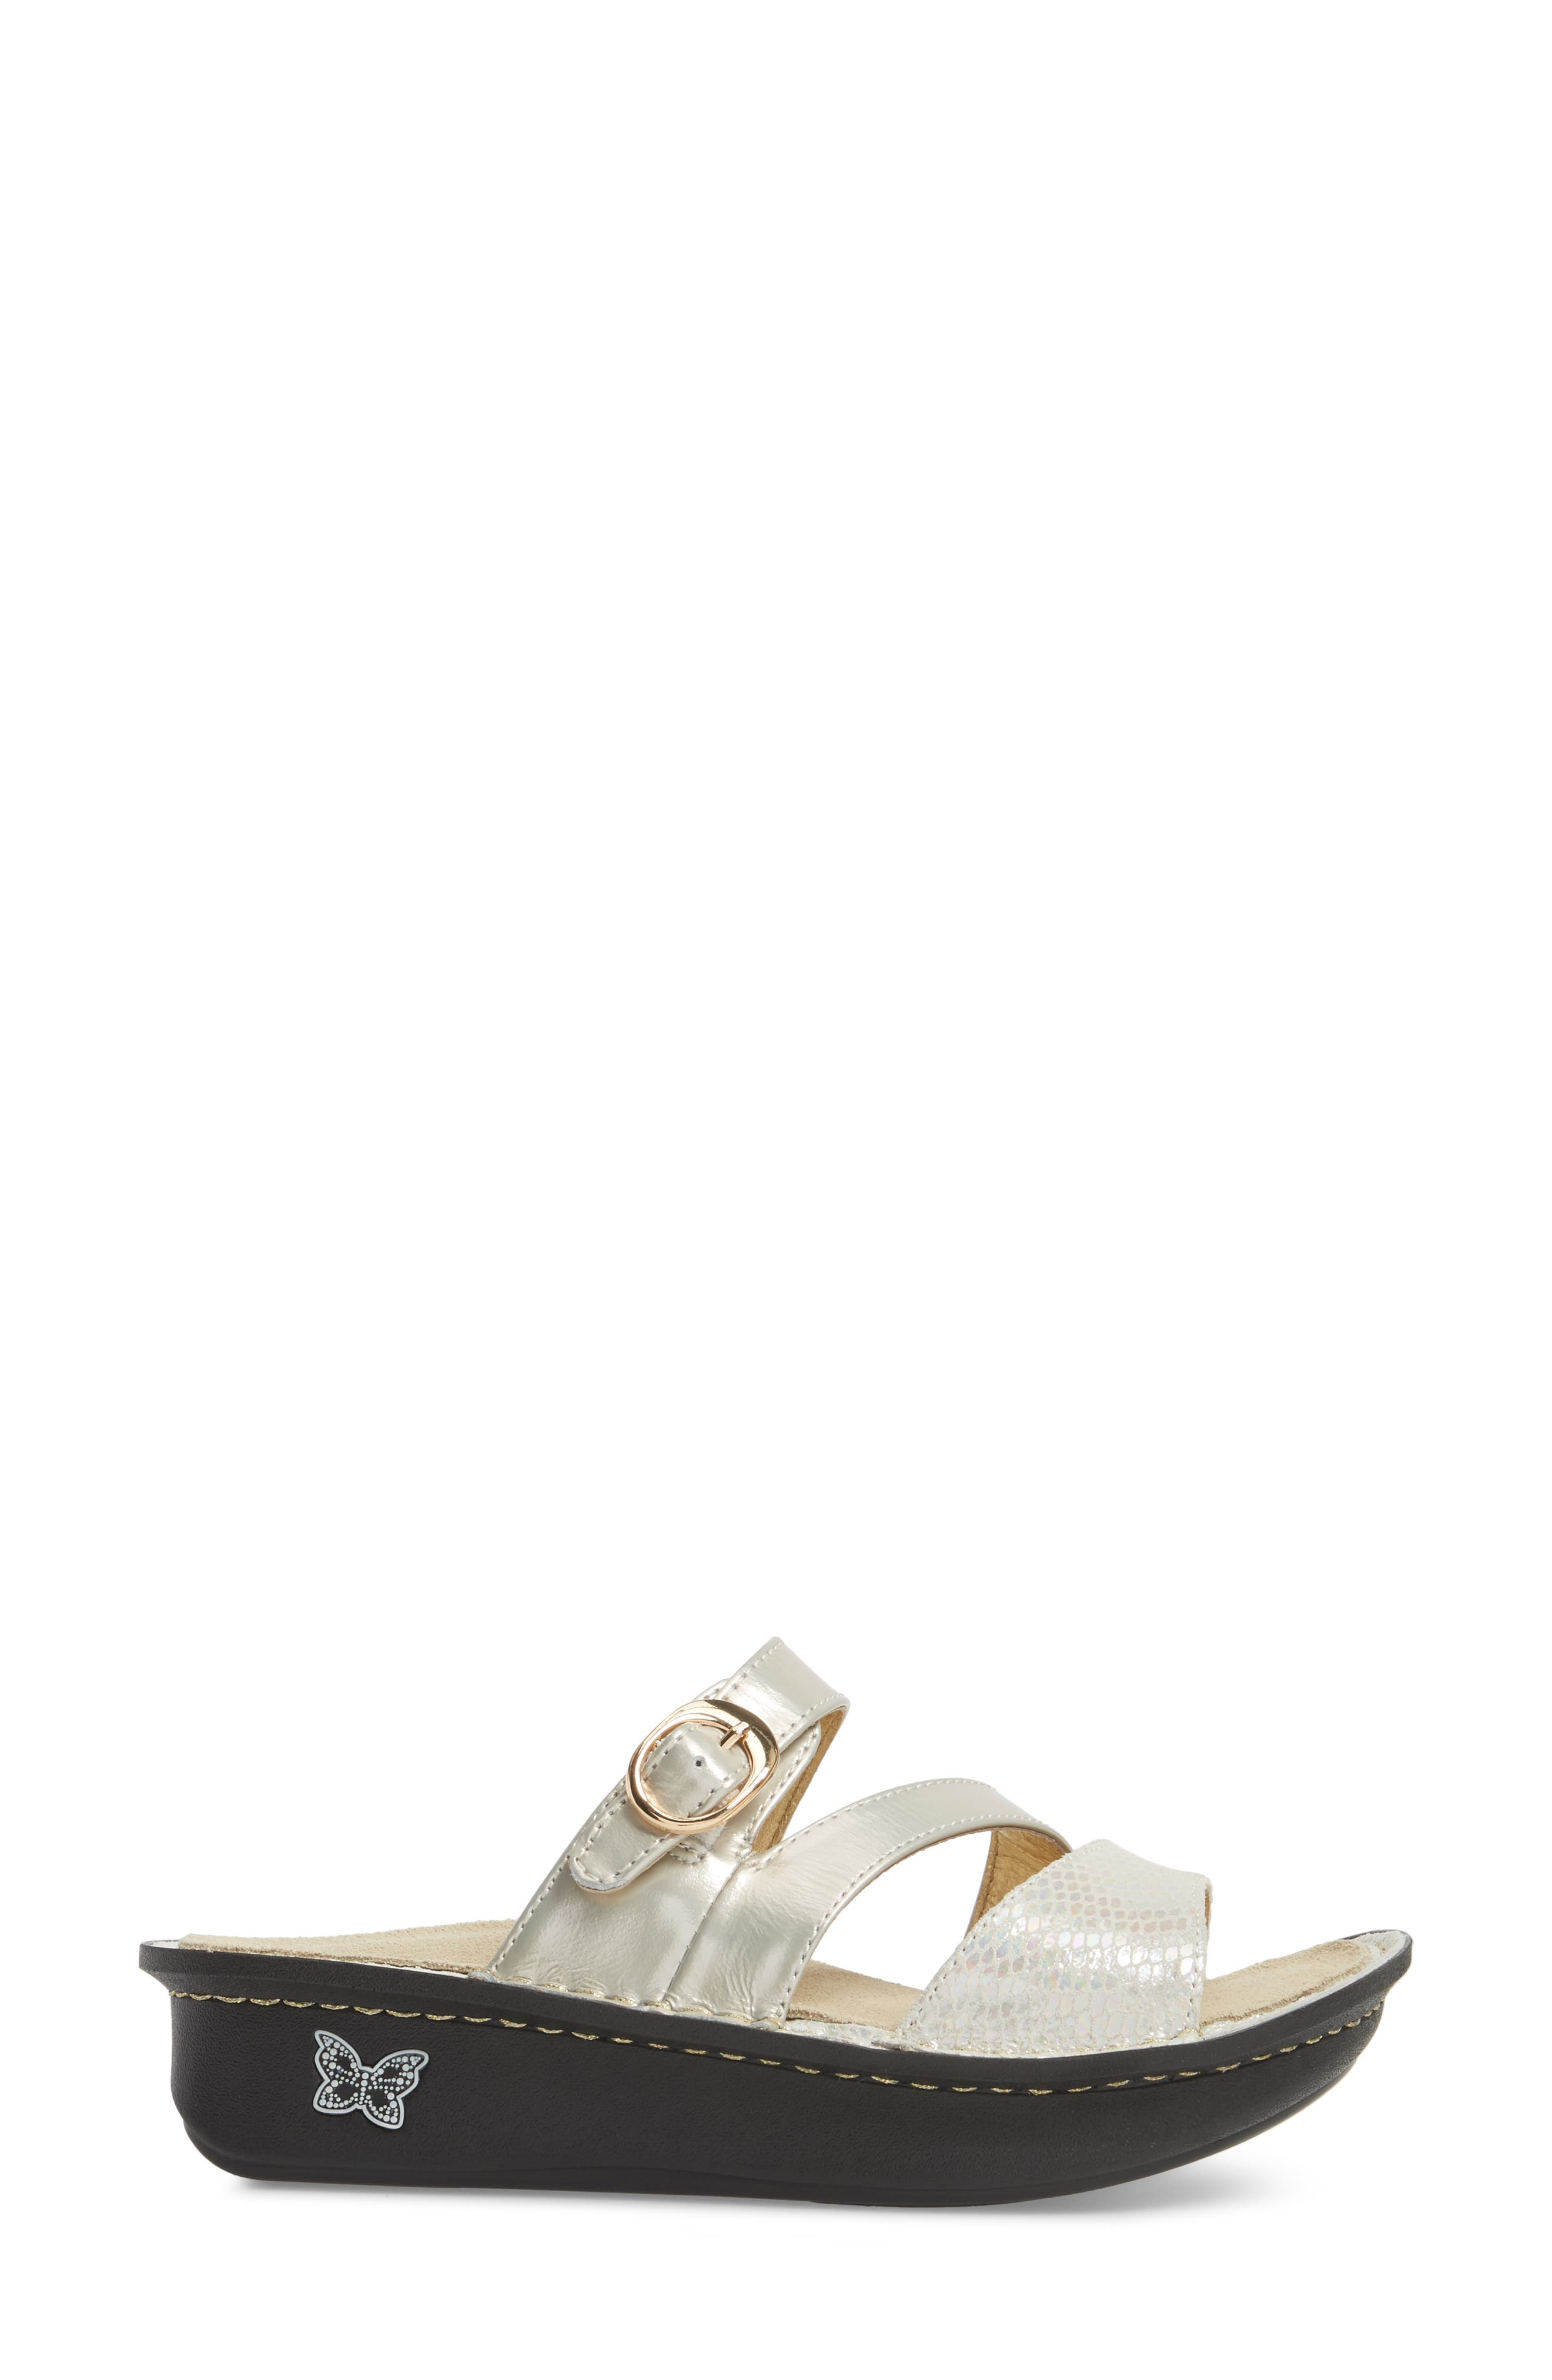 ALEGRIA, 'Colette' Platform Sandal, Alternate thumbnail 3, color, OPFULLY LEATHER